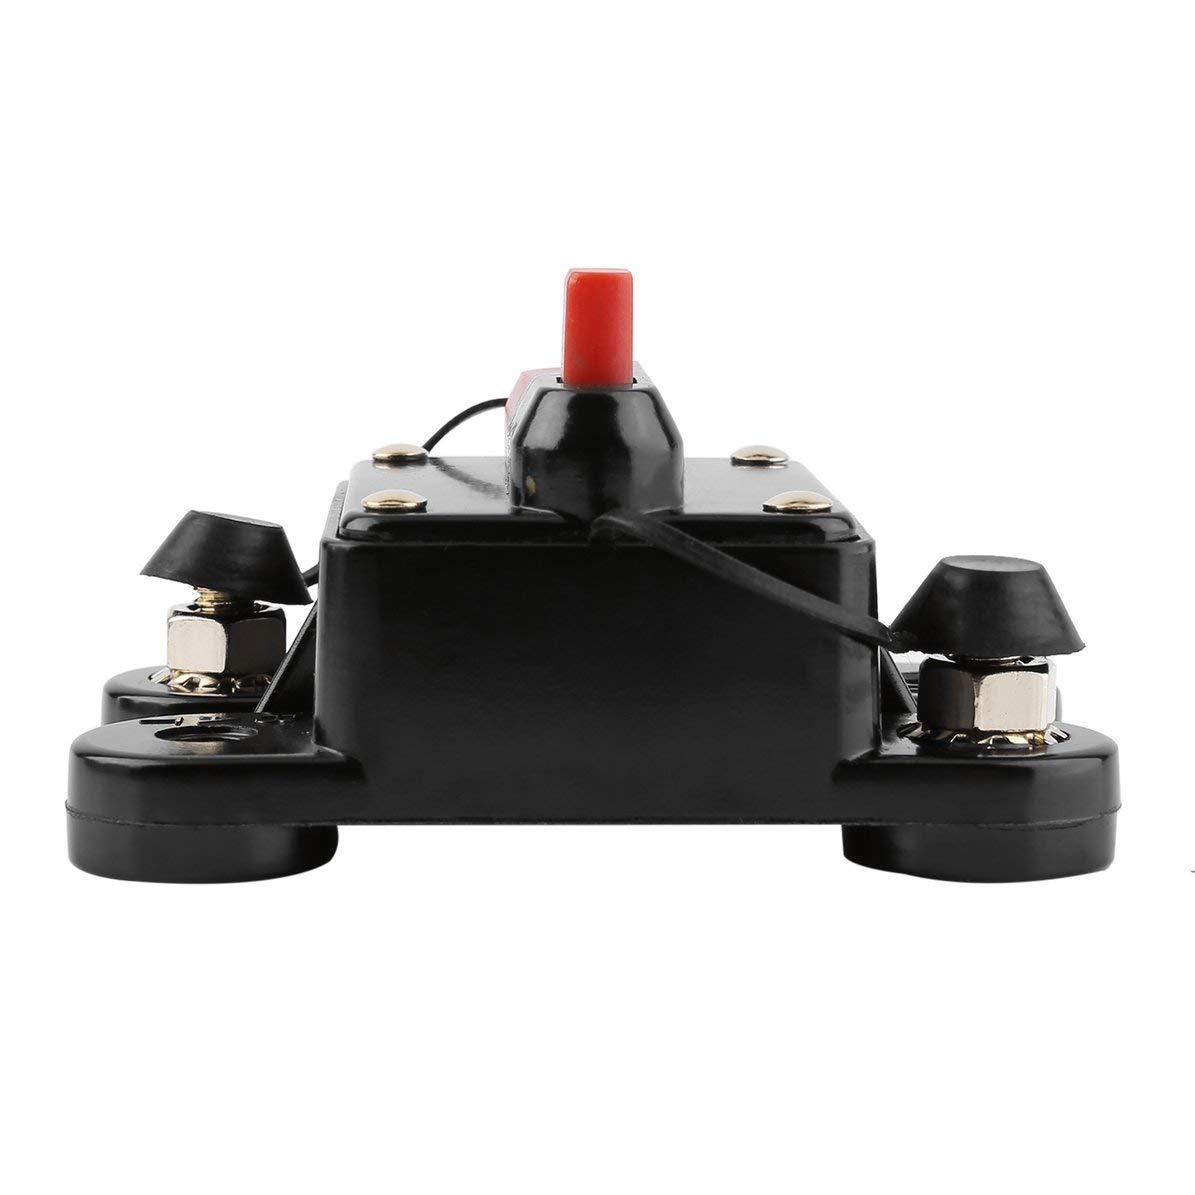 Sunnyflowk 50A 60A 80A 100A 125A 150A 200A 250A opzionale Car Audio Inline Fusibile dellinterruttore per protezione 12V SKCB-01-100A 125 nero